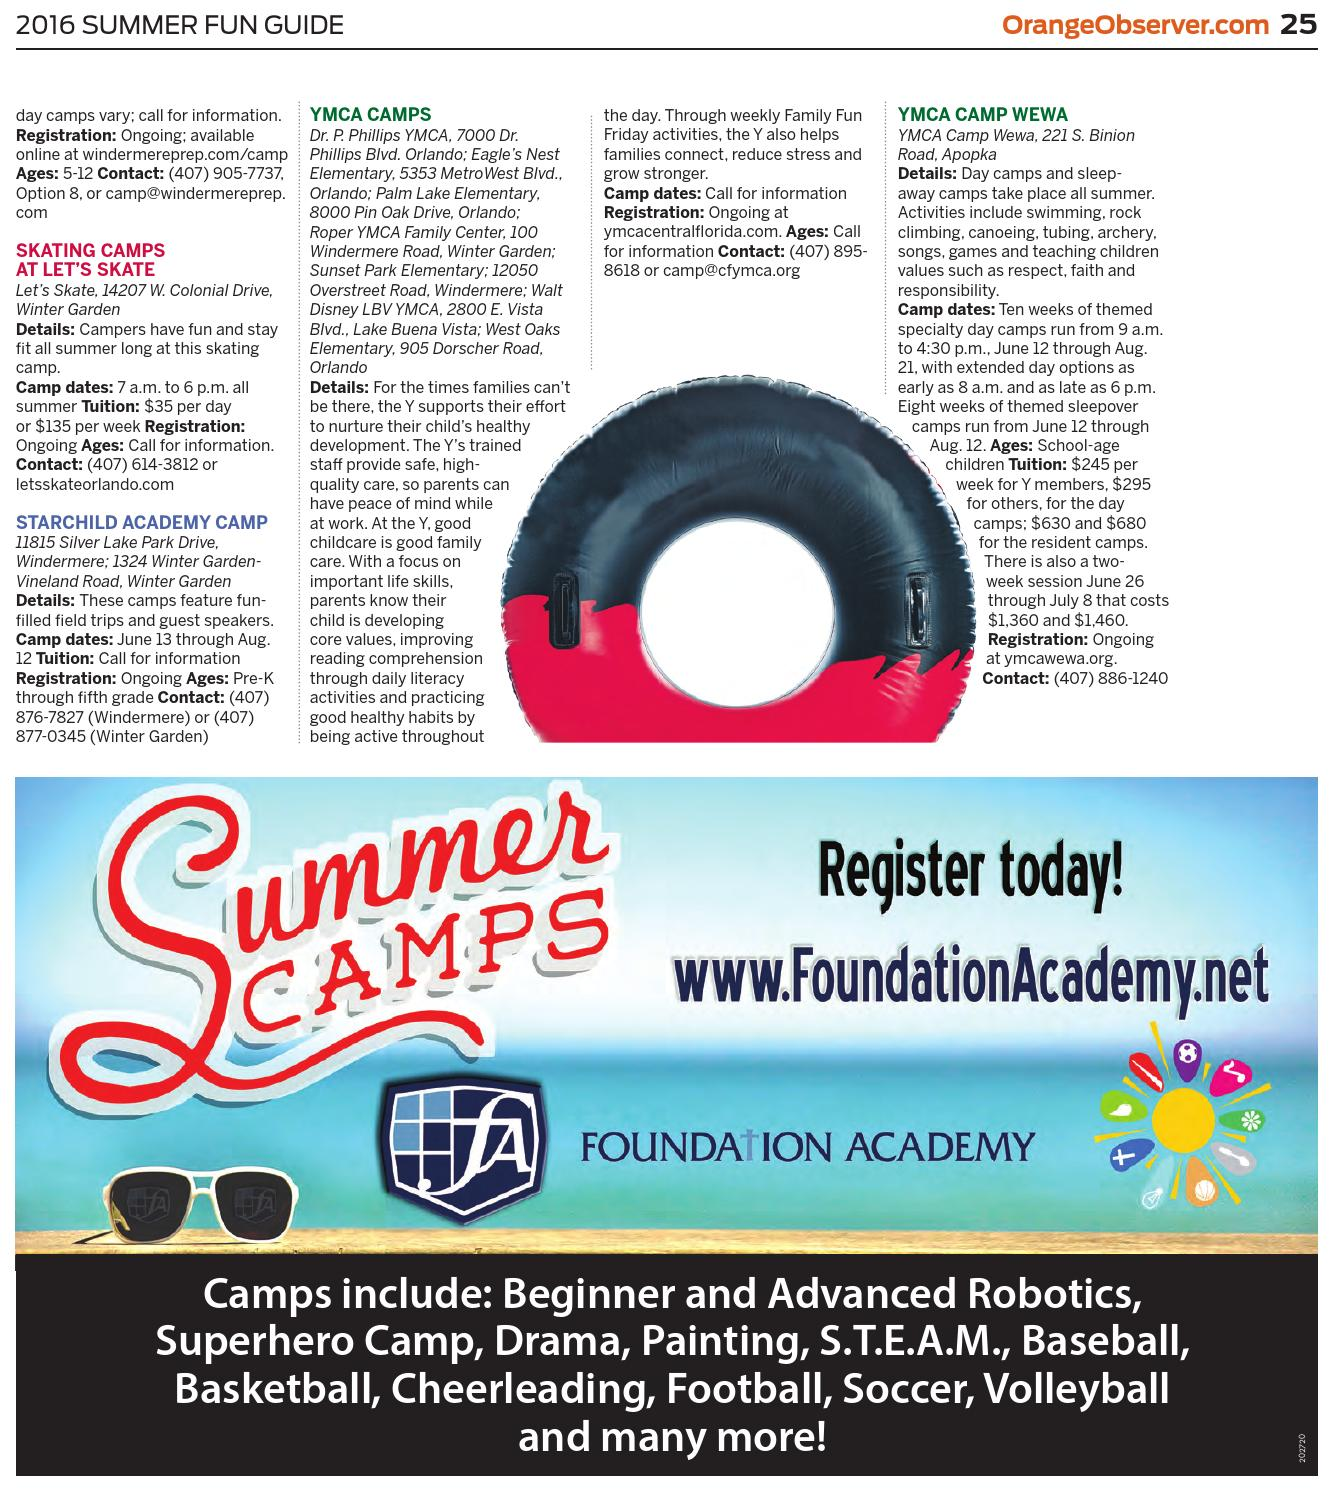 04 14 16 summer fun guide 2016 by orange observer issuu